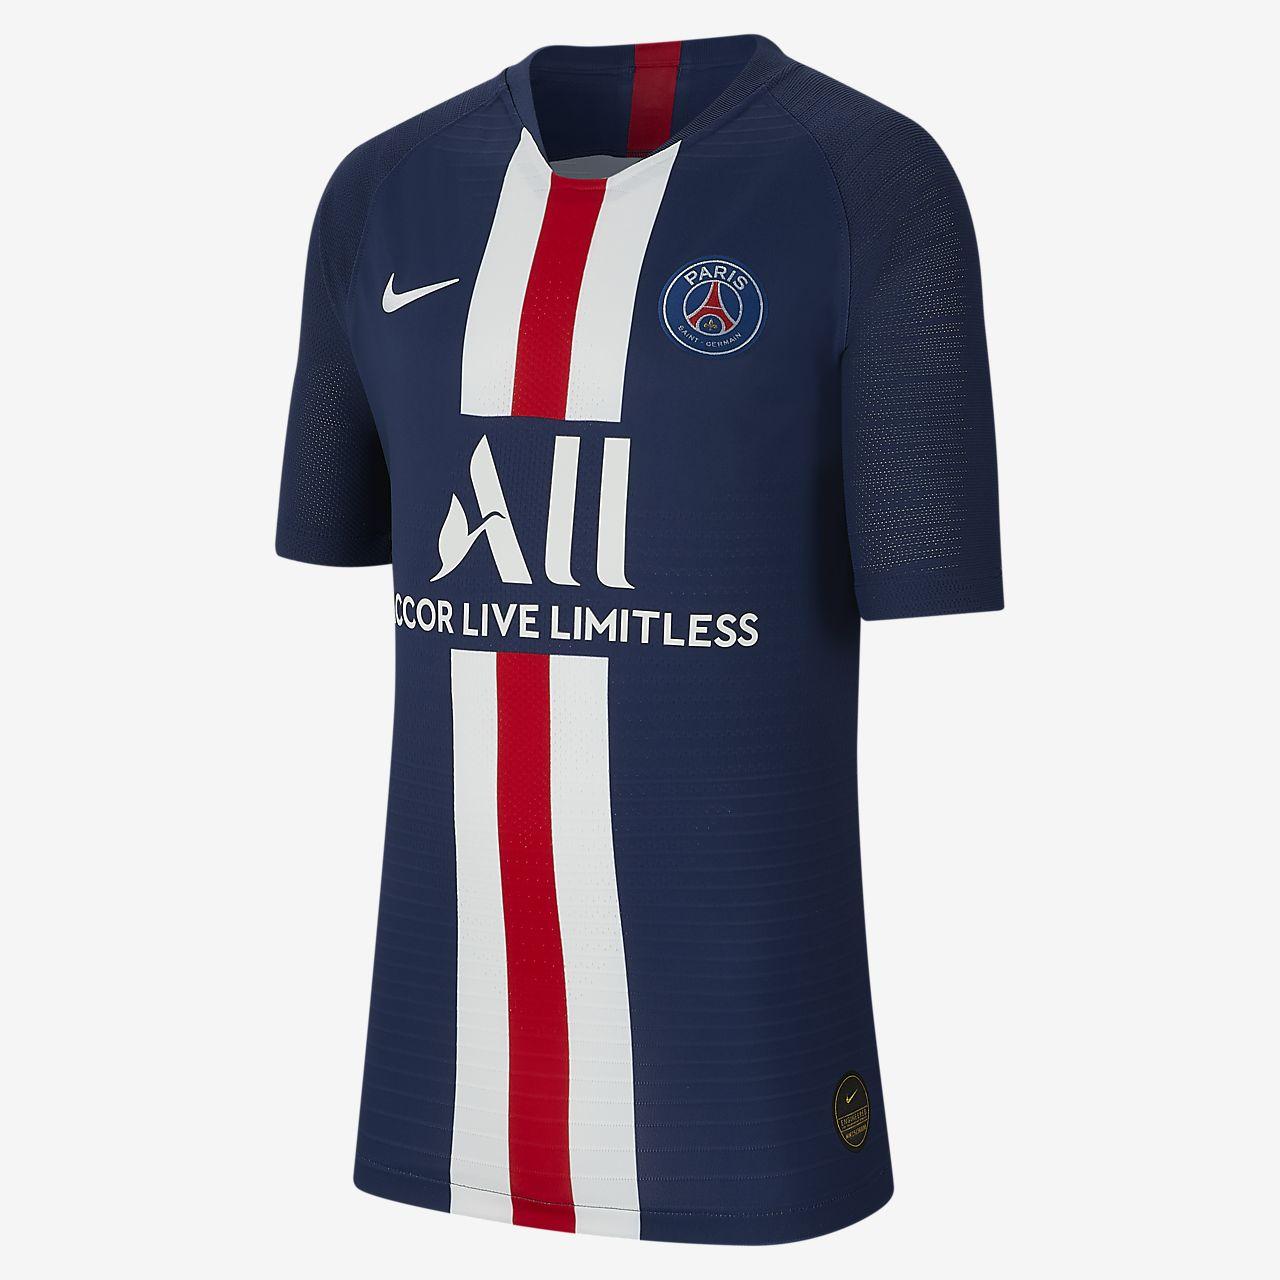 Paris Saint-Germain 2019/20 Vapor Match Home Fußballtrikot für ältere Kinder